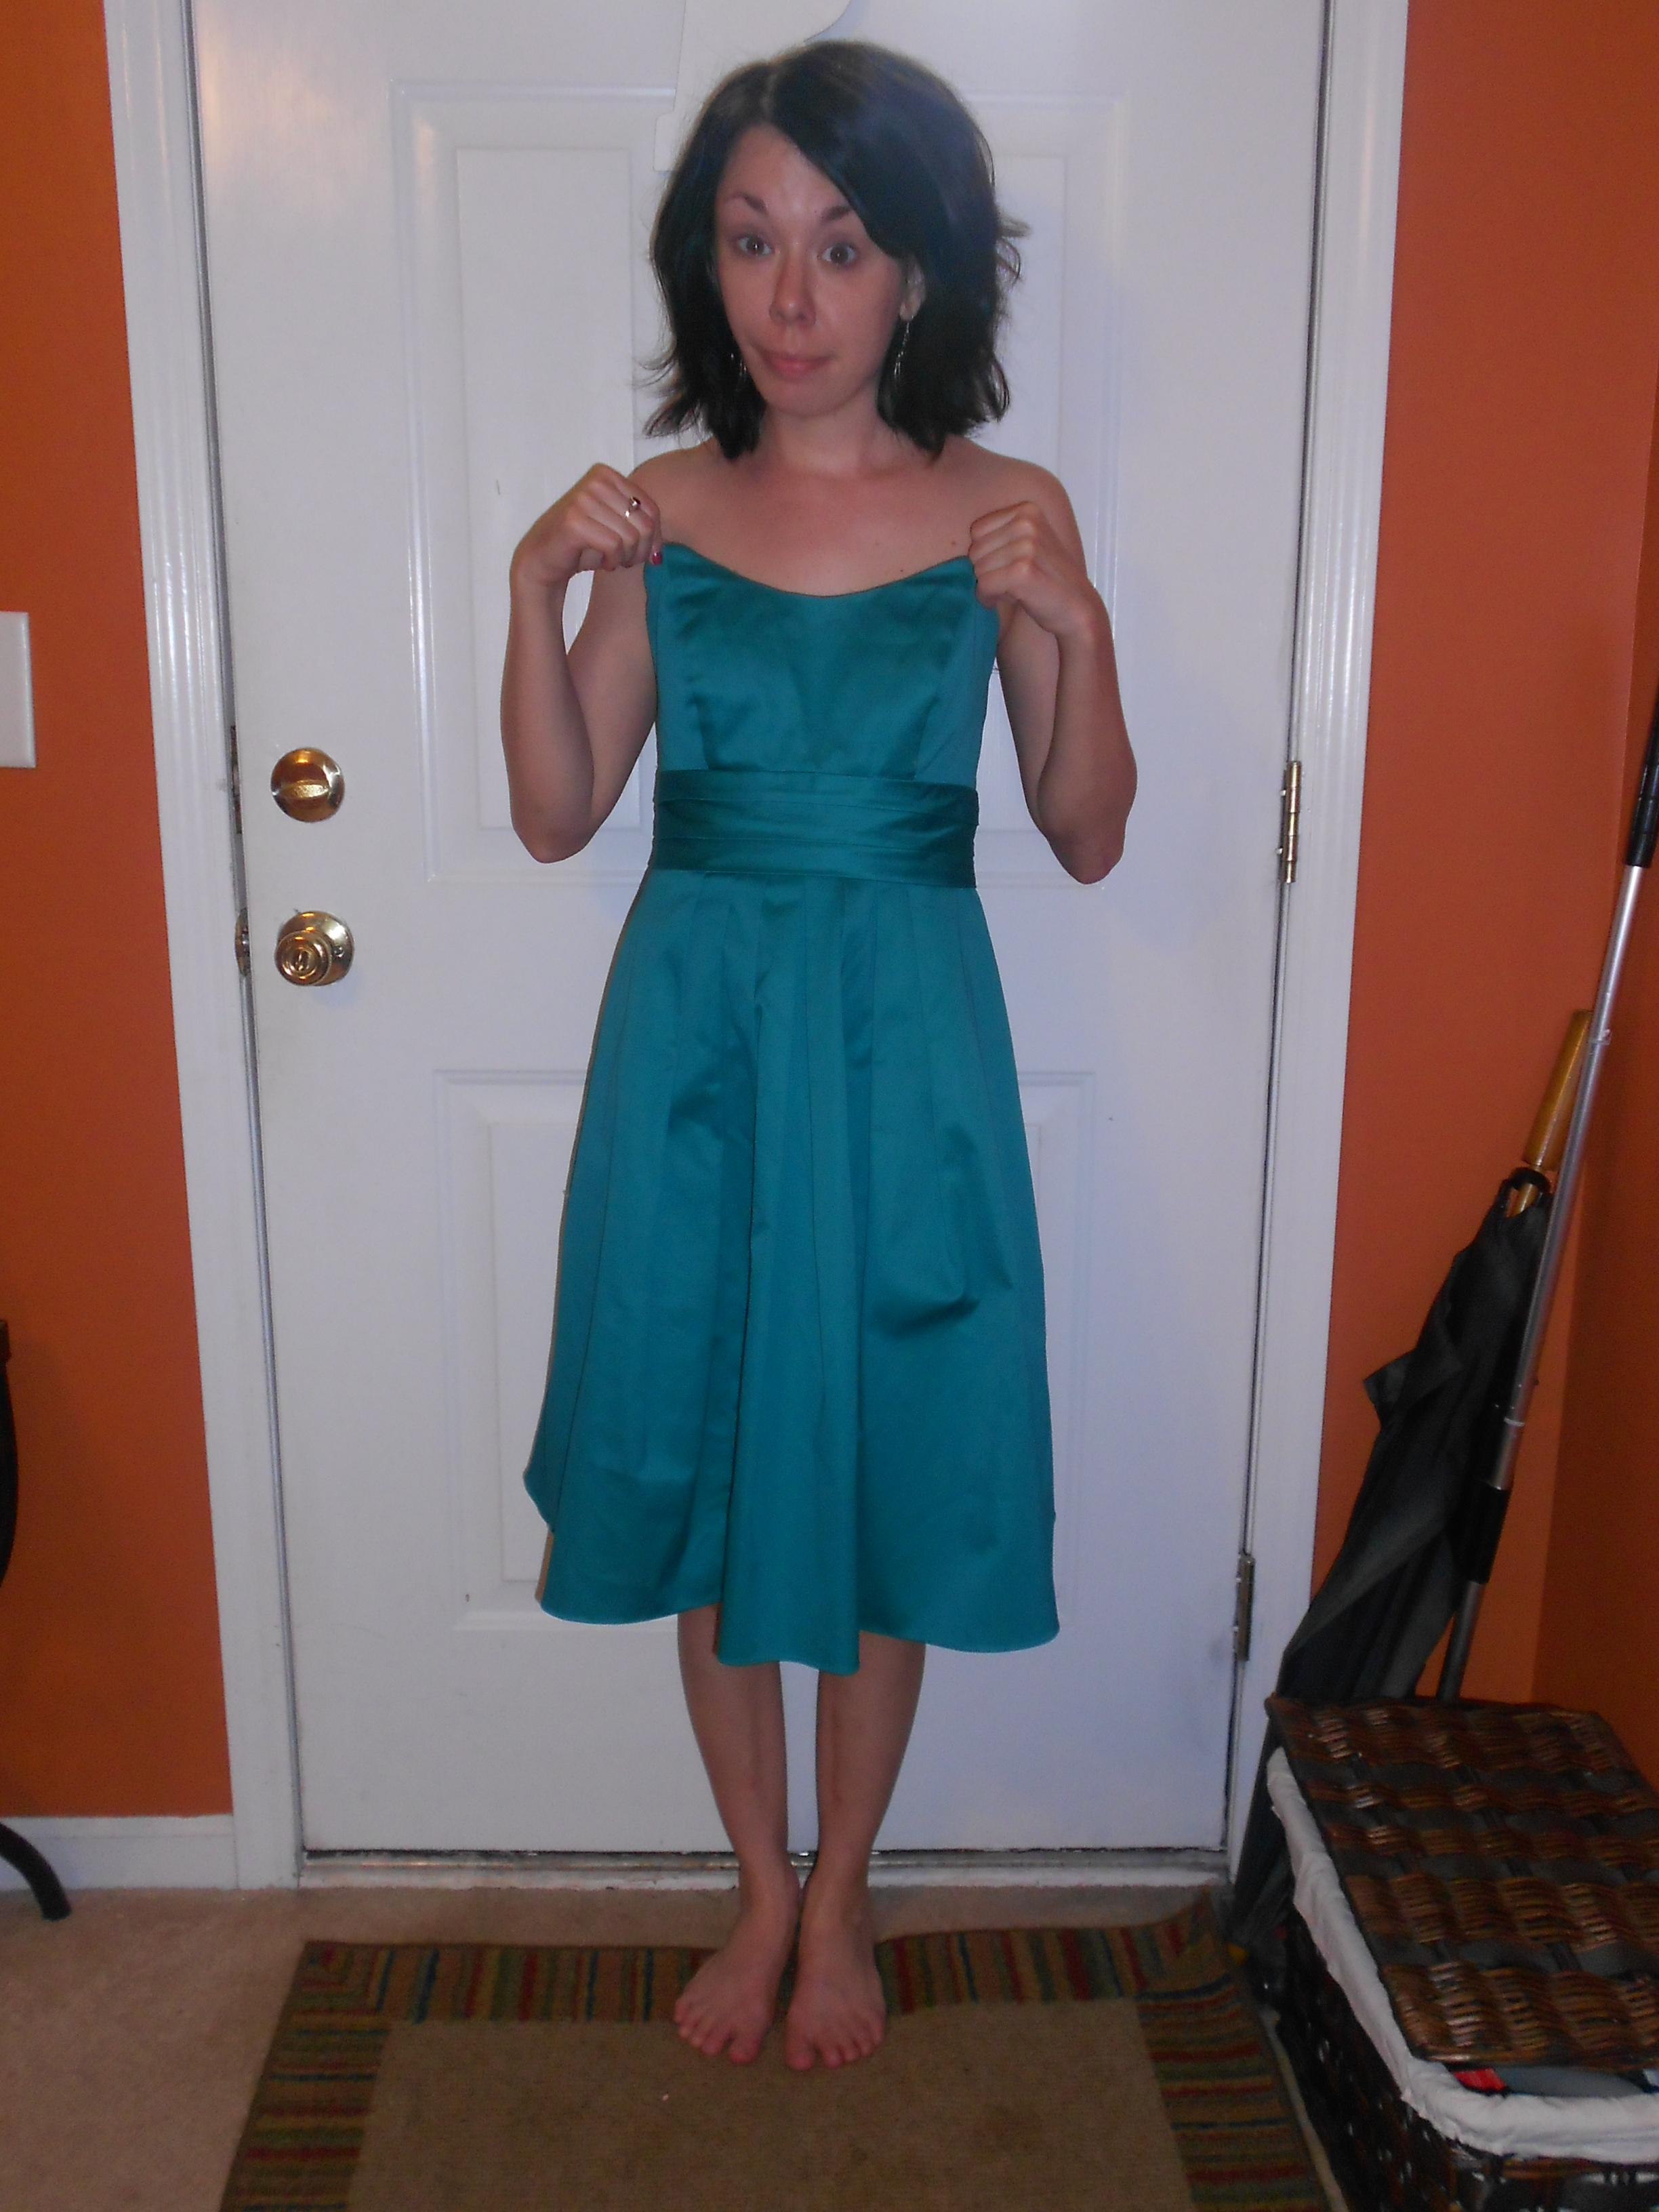 Day 272: Never a Bride Dress 2